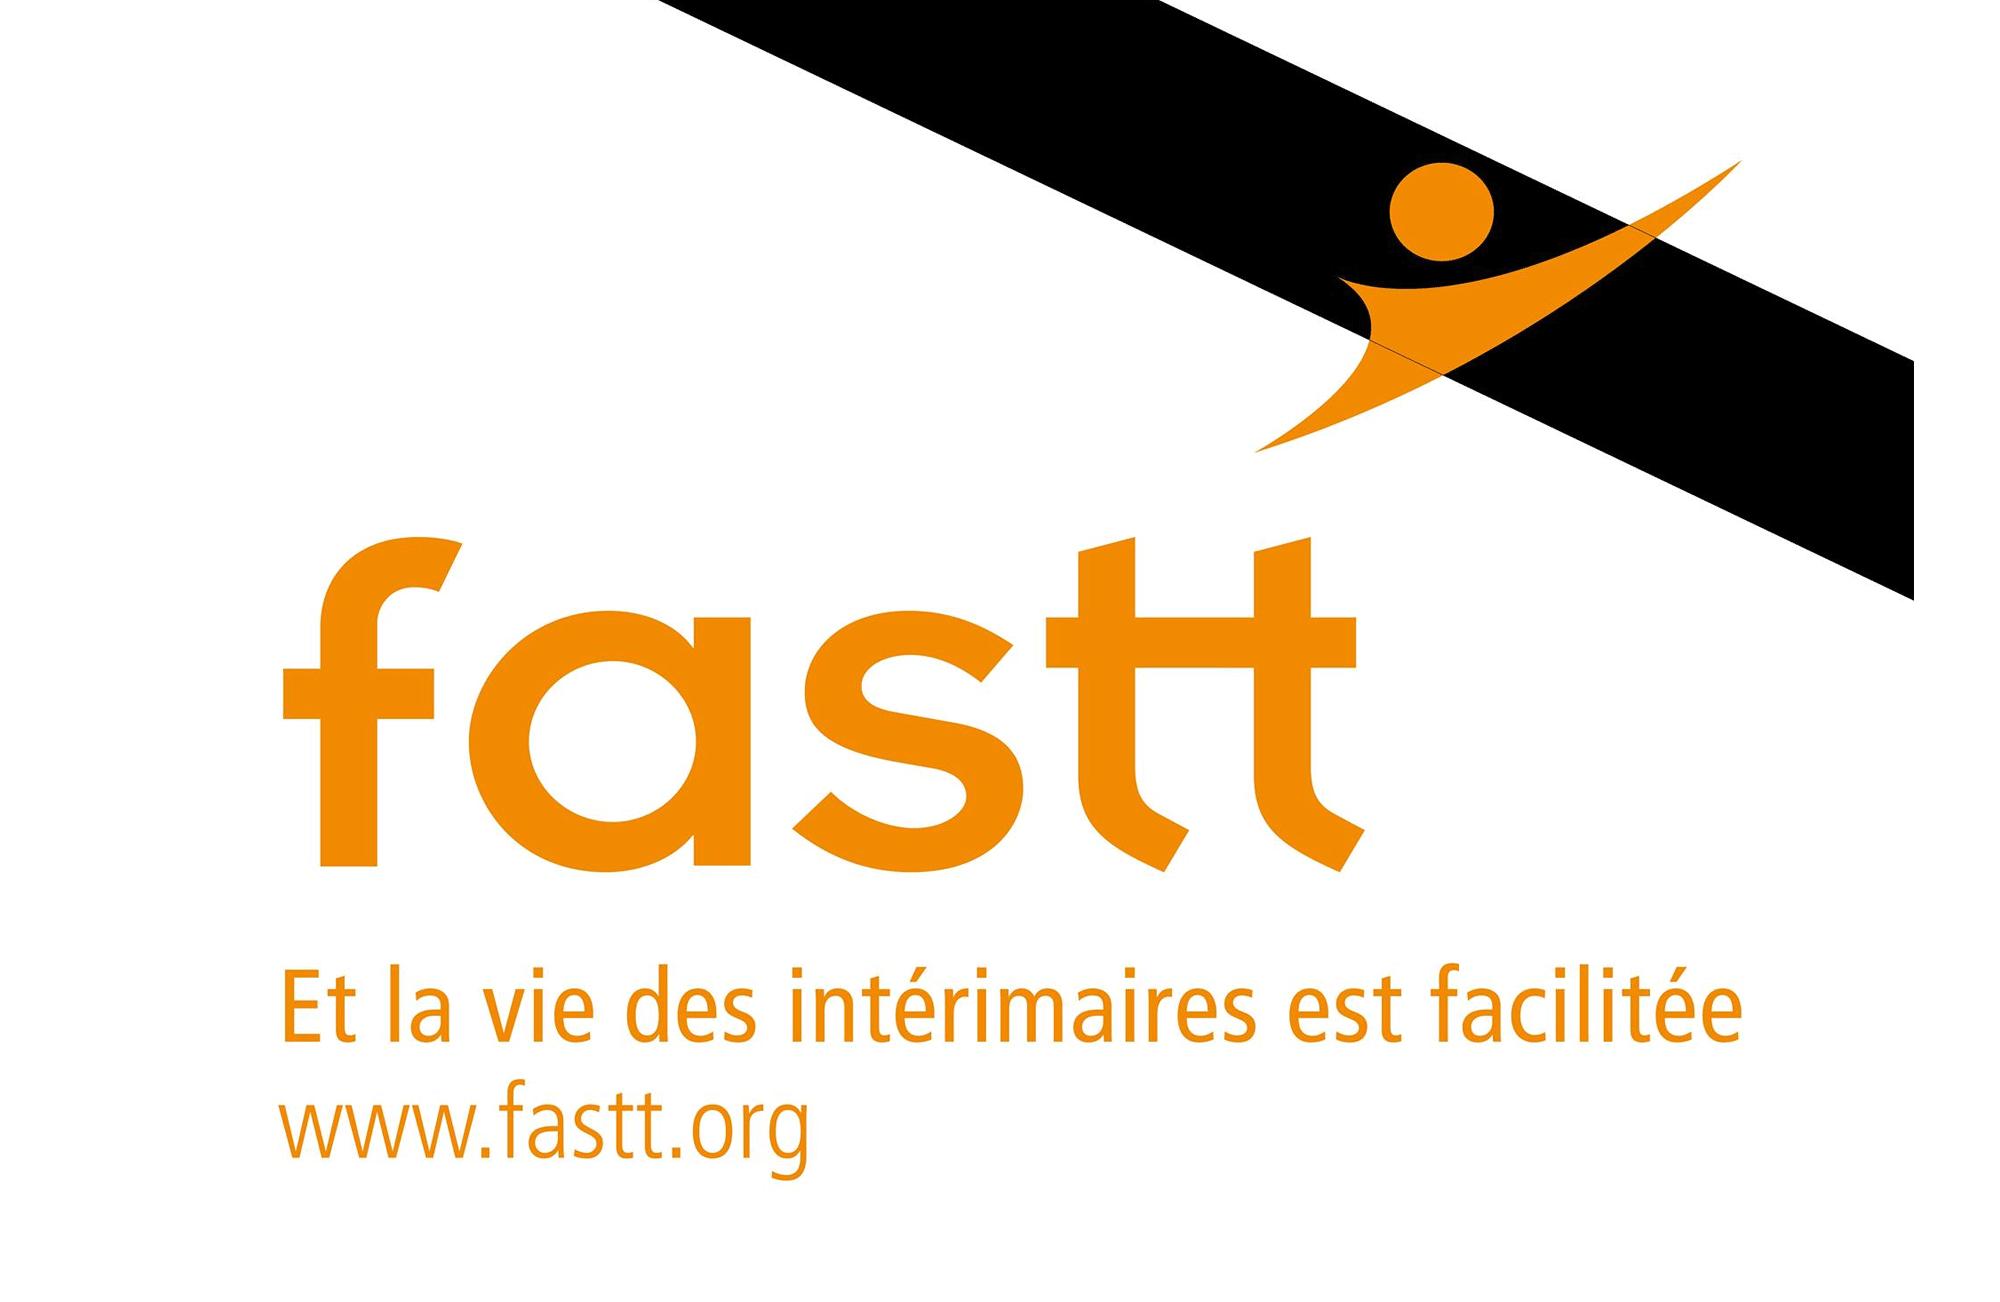 Le FASST avantages candidats - Aboutir Emploi & Transparence